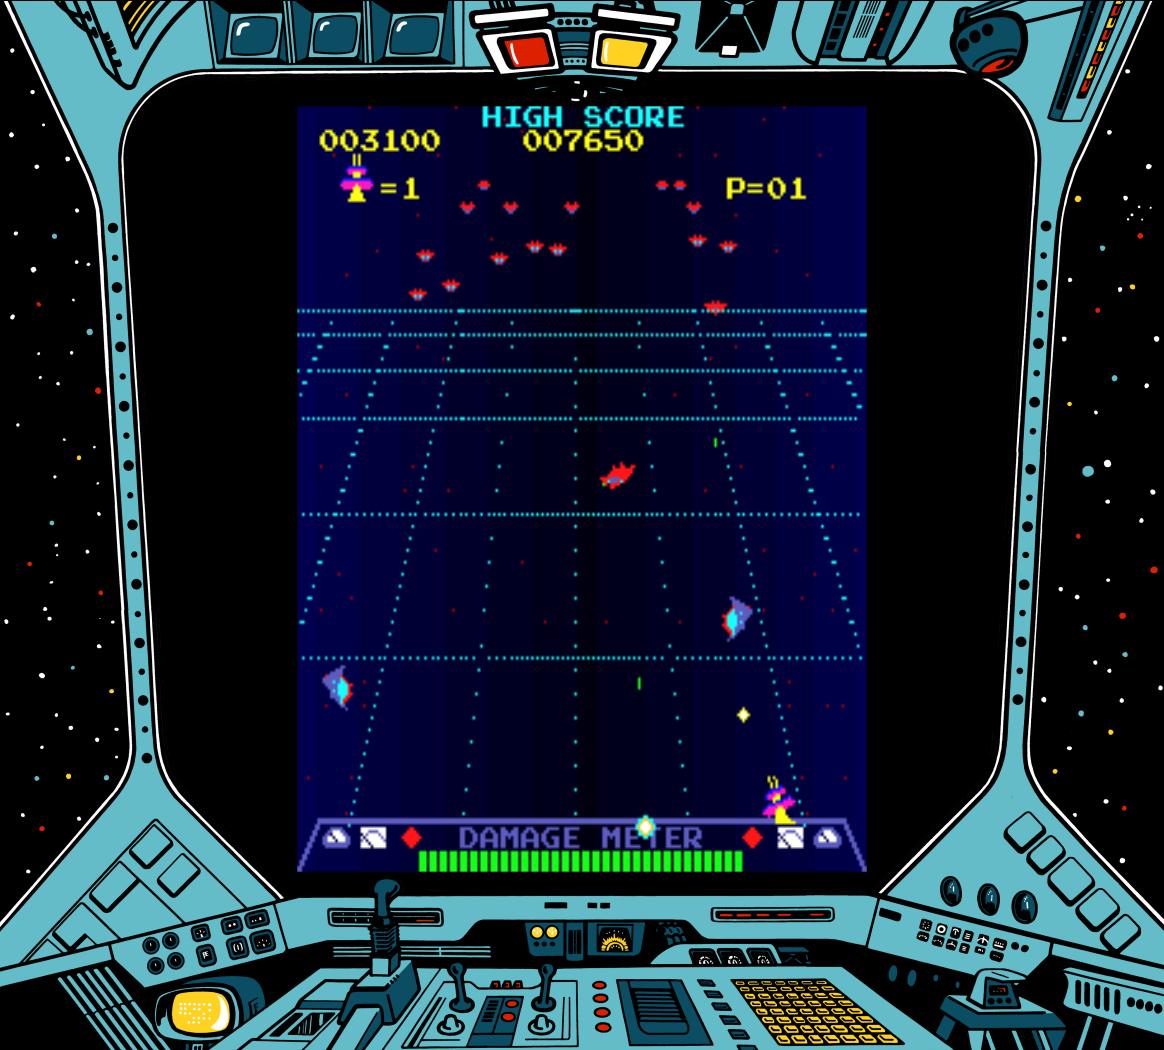 Gameplay image of Radarscope, an arcade video game by Nintendo 1981